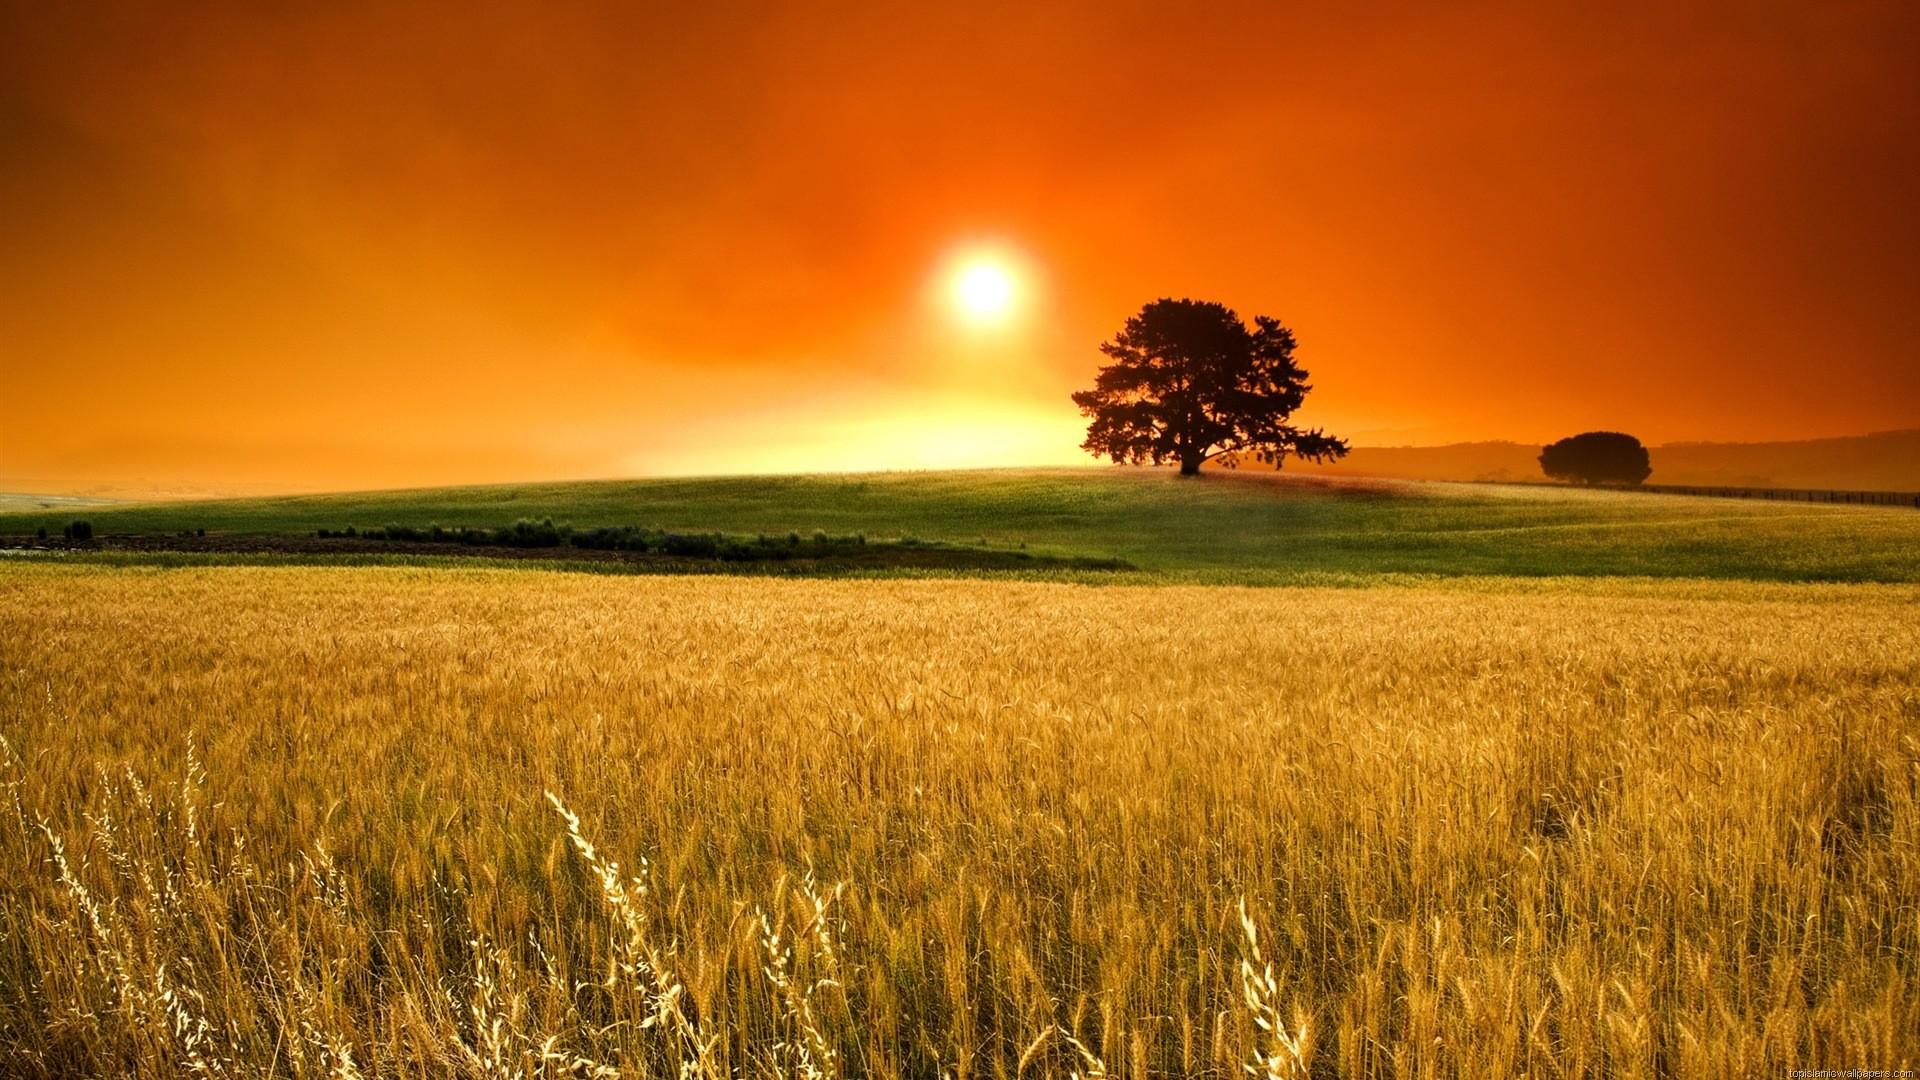 1920x1080 Beautiful Sunrise HD Wallpaper From Field